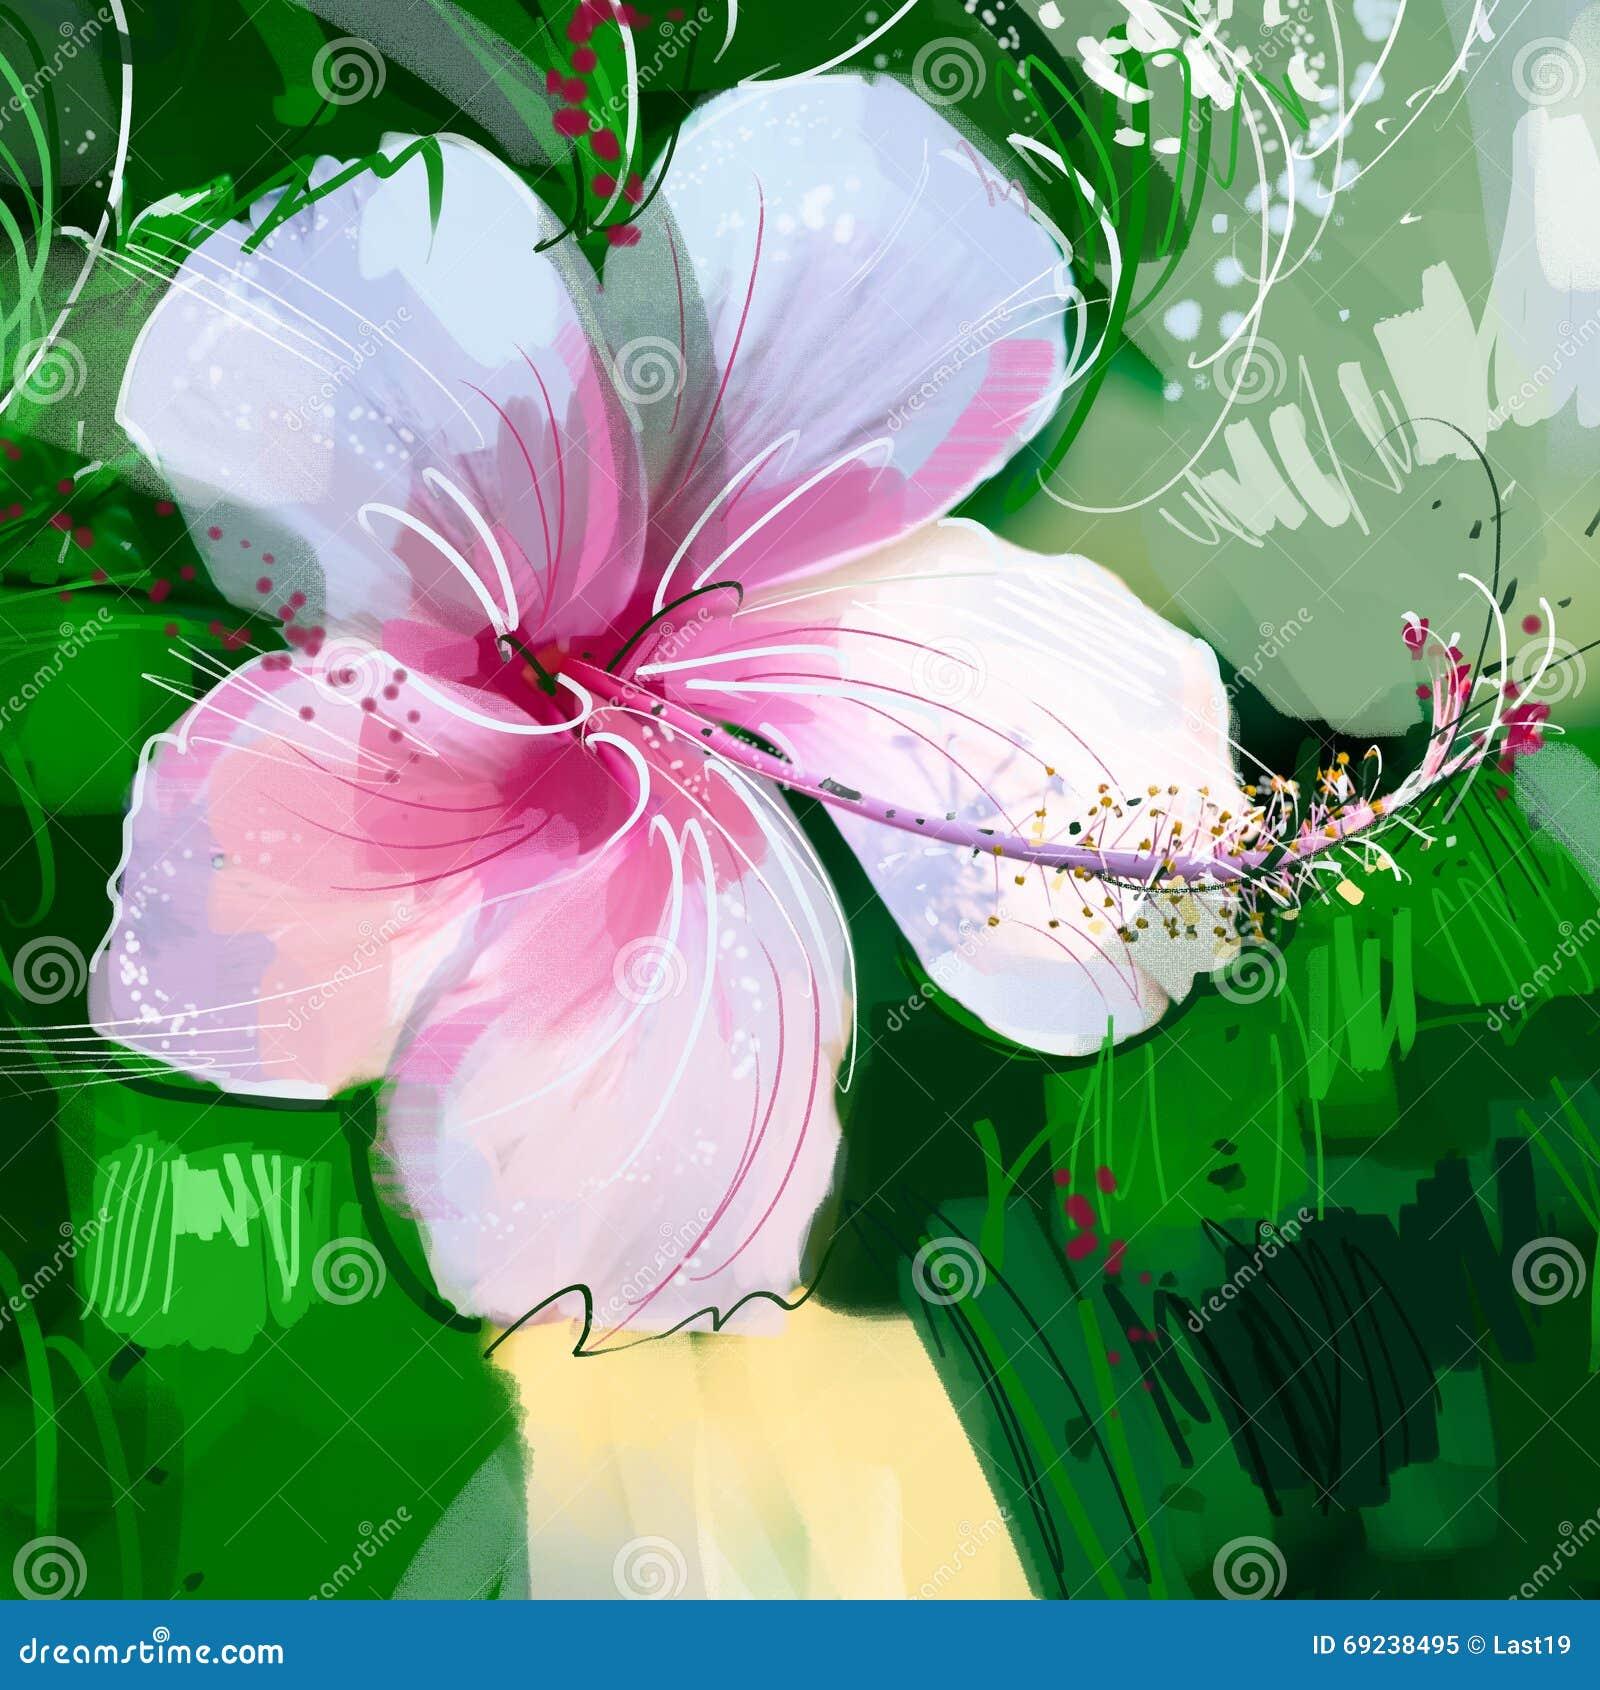 Painting Pink Hibiscus Flower Stock Illustration Illustration Of